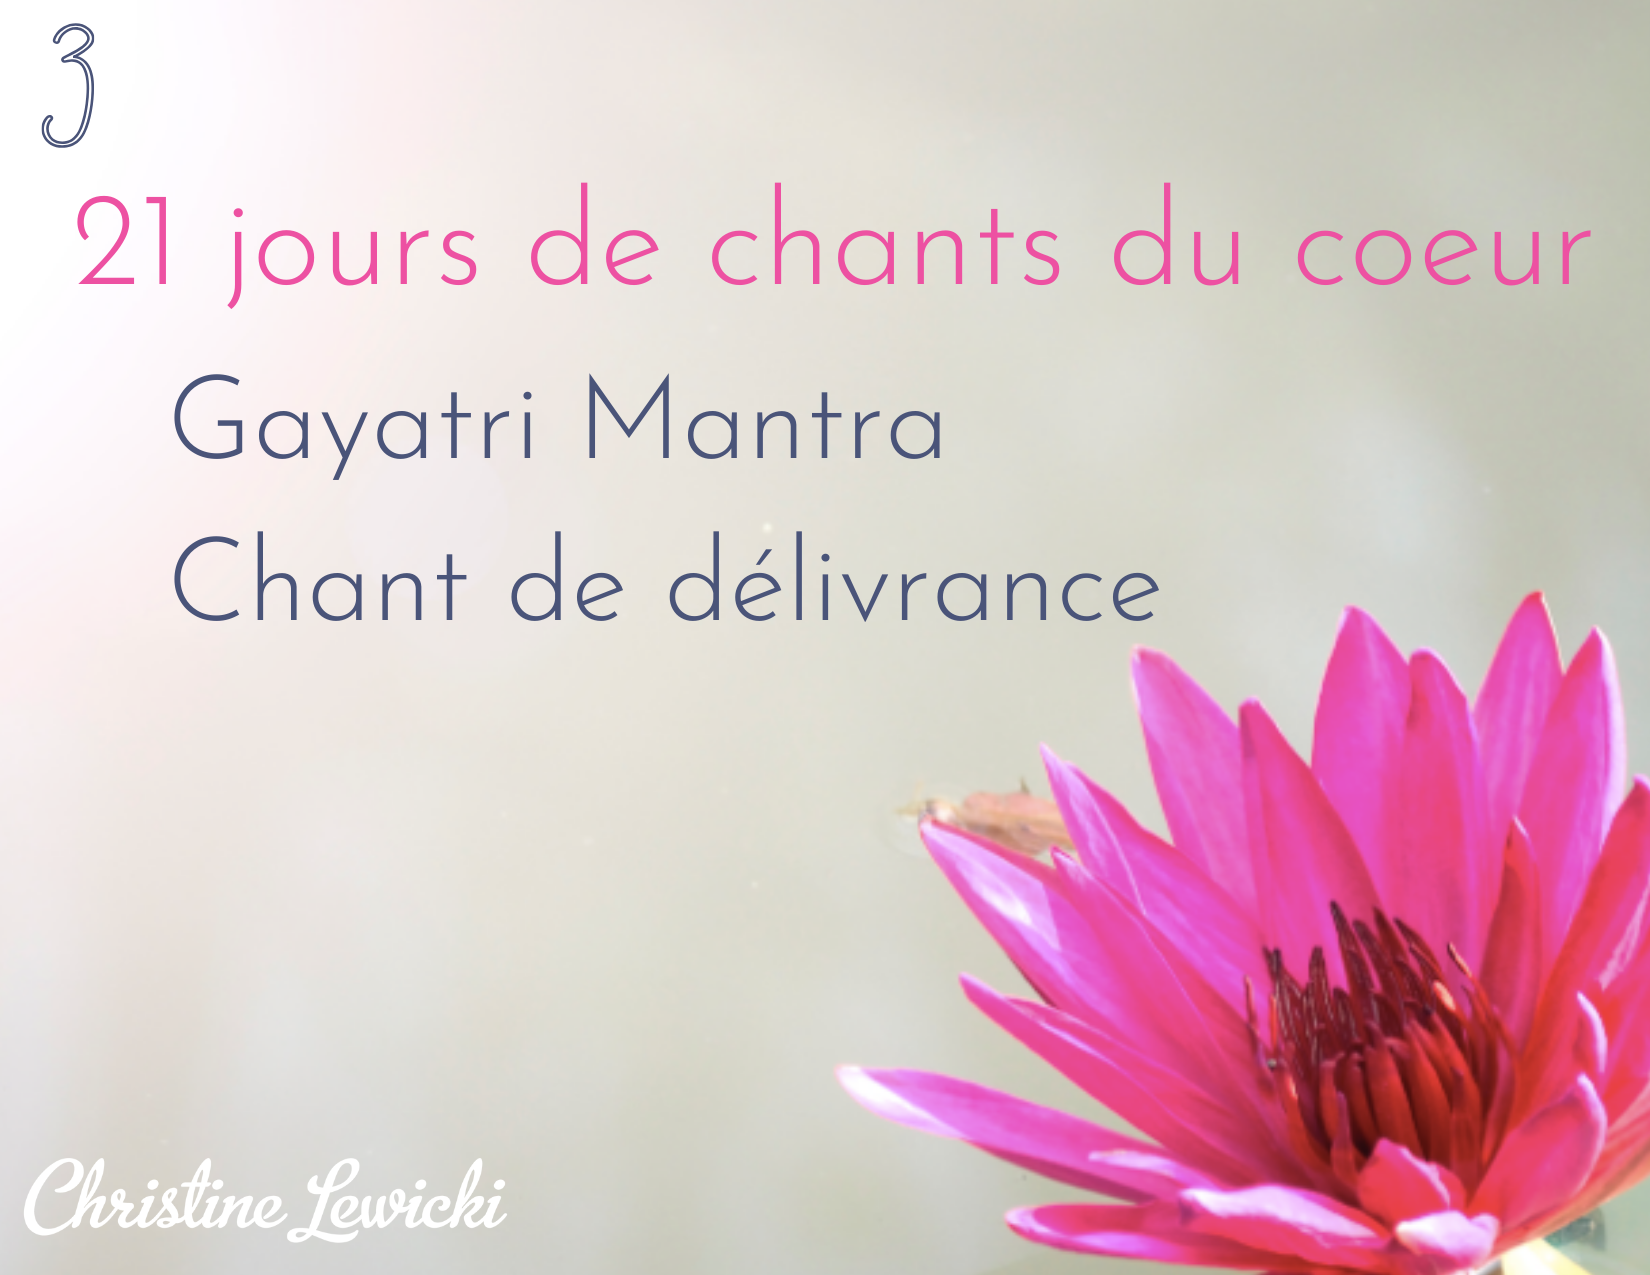 Gayatri mantra - chant de délivrance